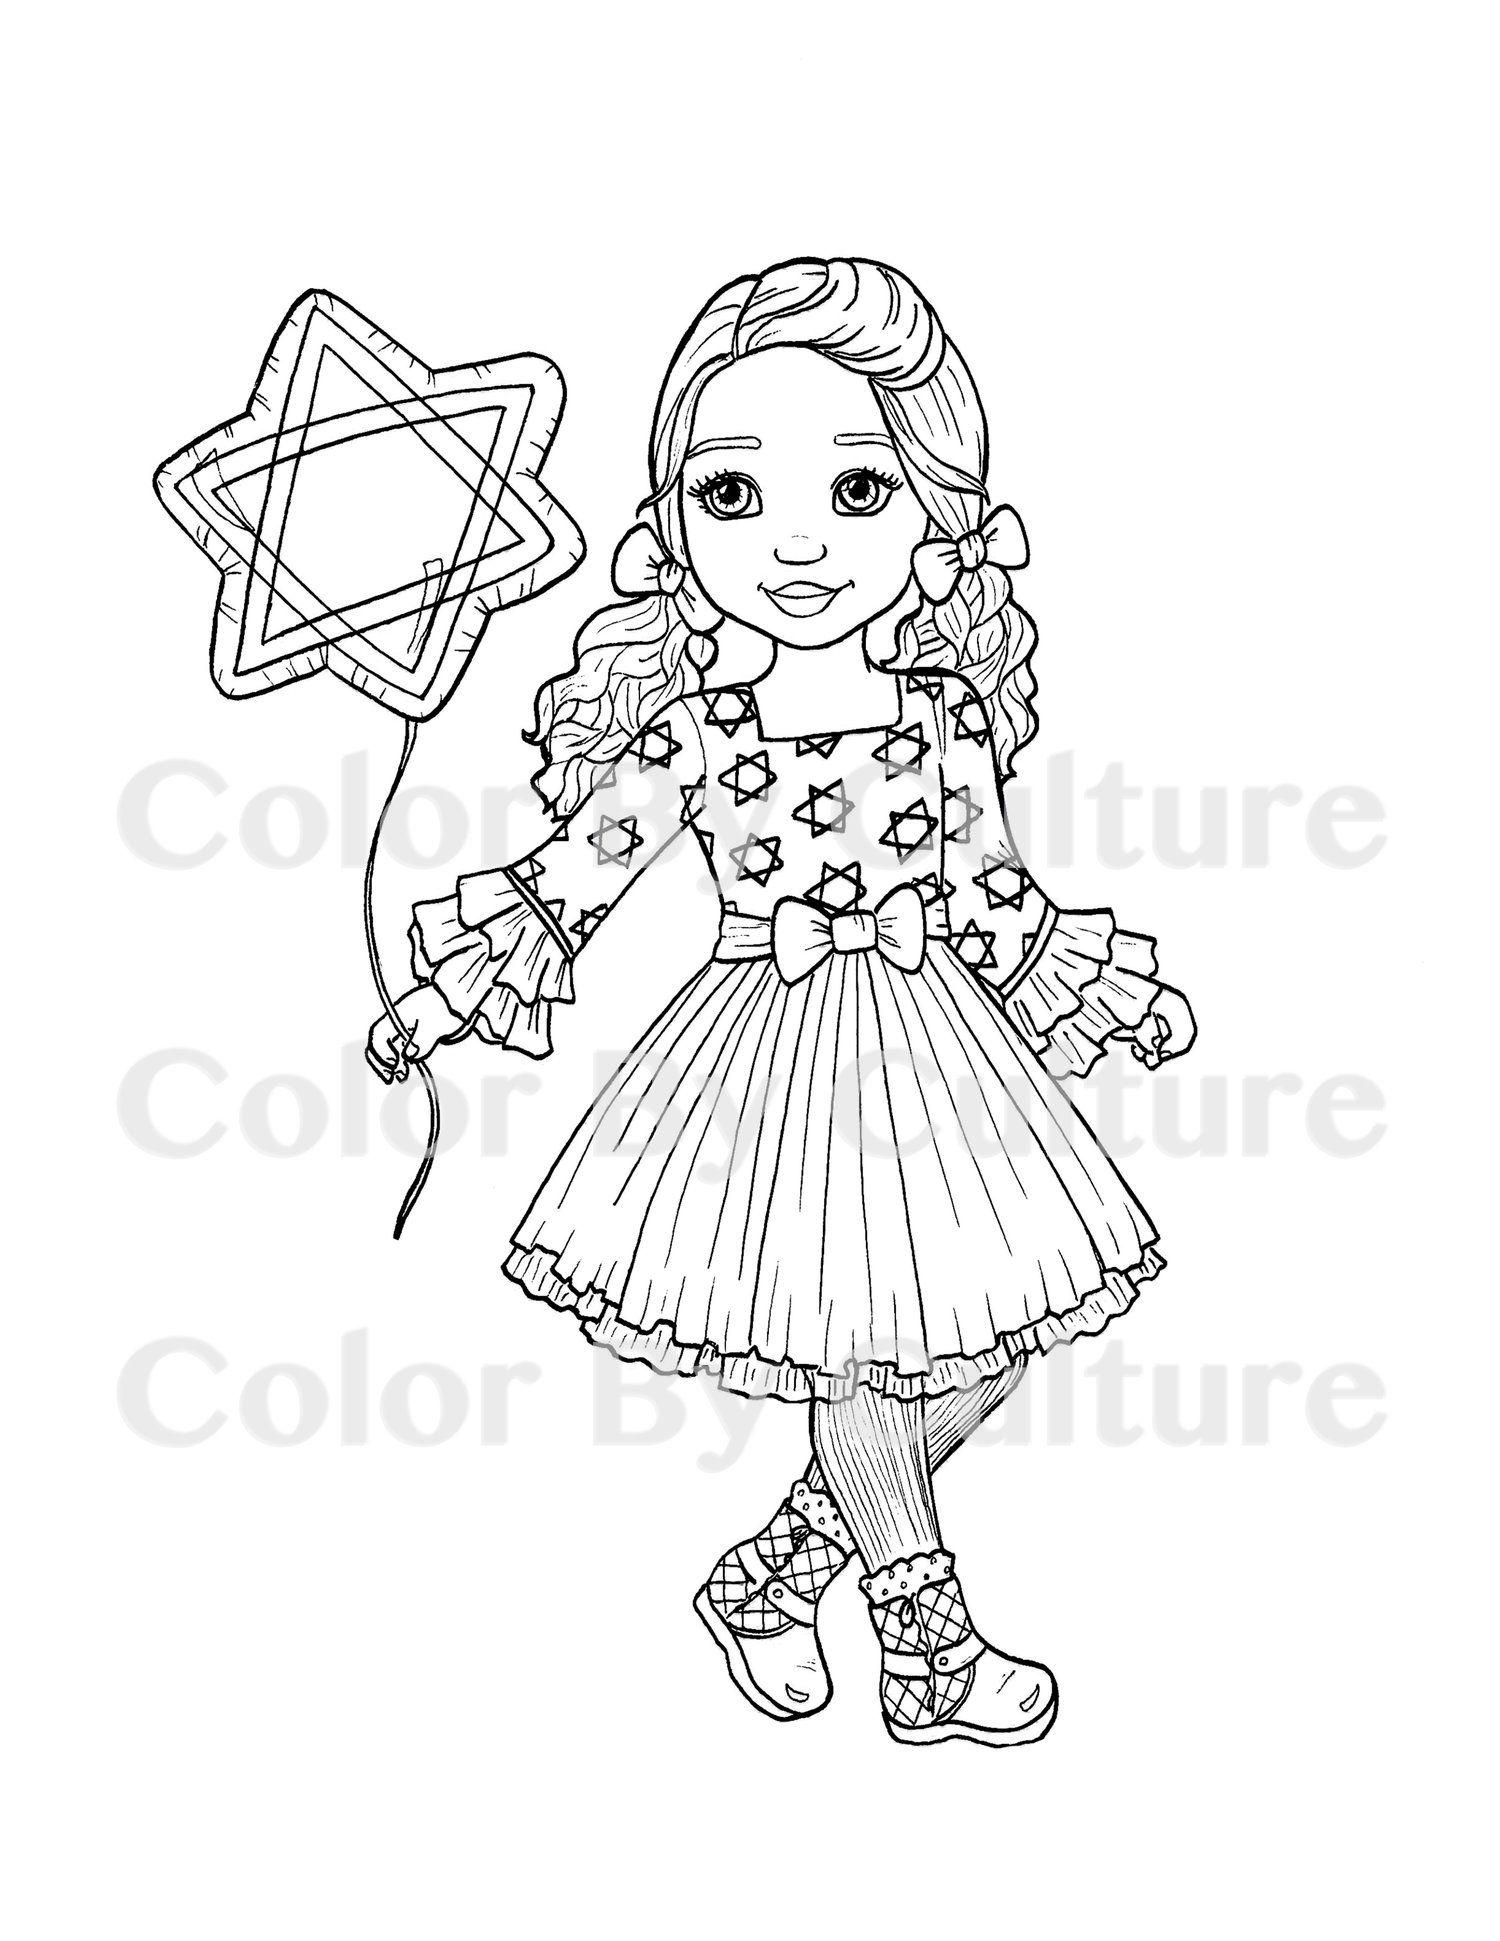 Hanukkah Girl - Coloring Page & Digital Stamp | Babycakes